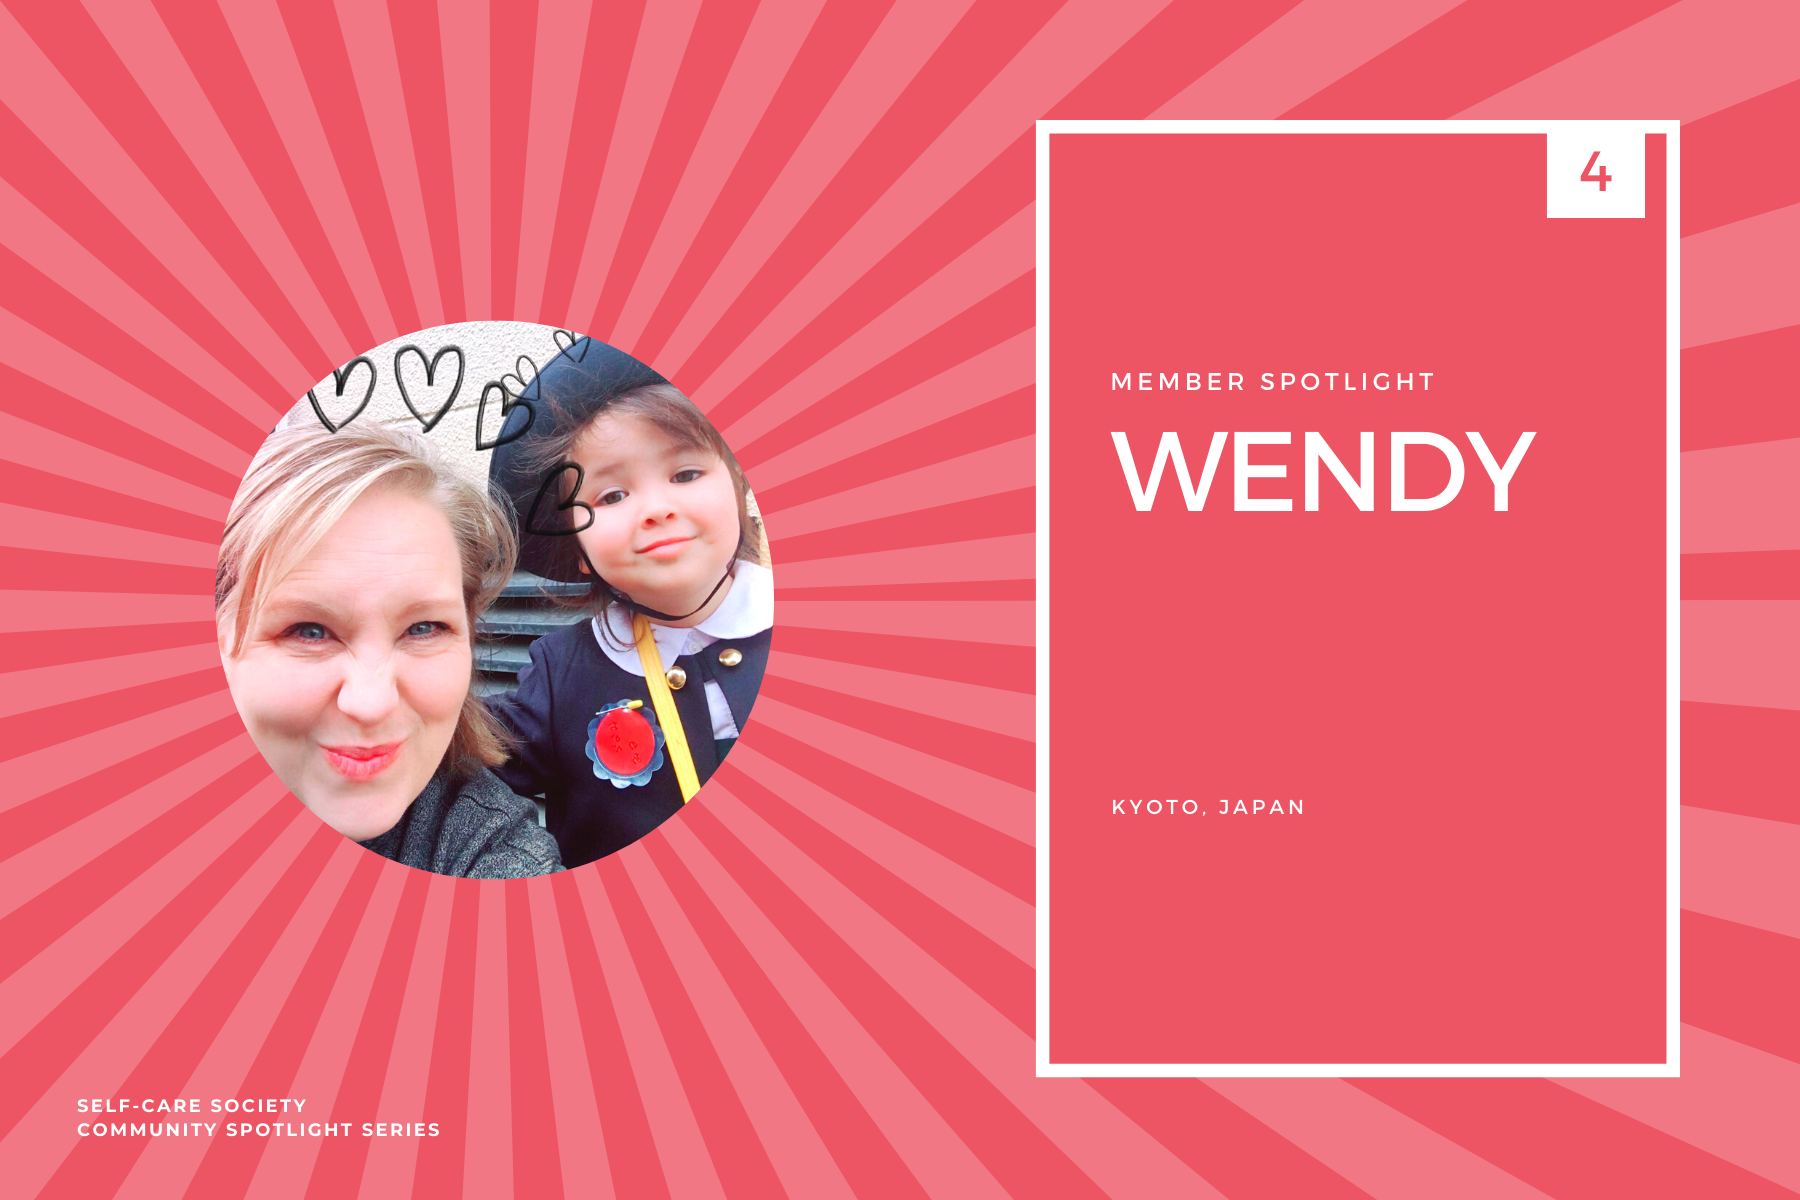 Self-Care Community Spotlight - Wendy